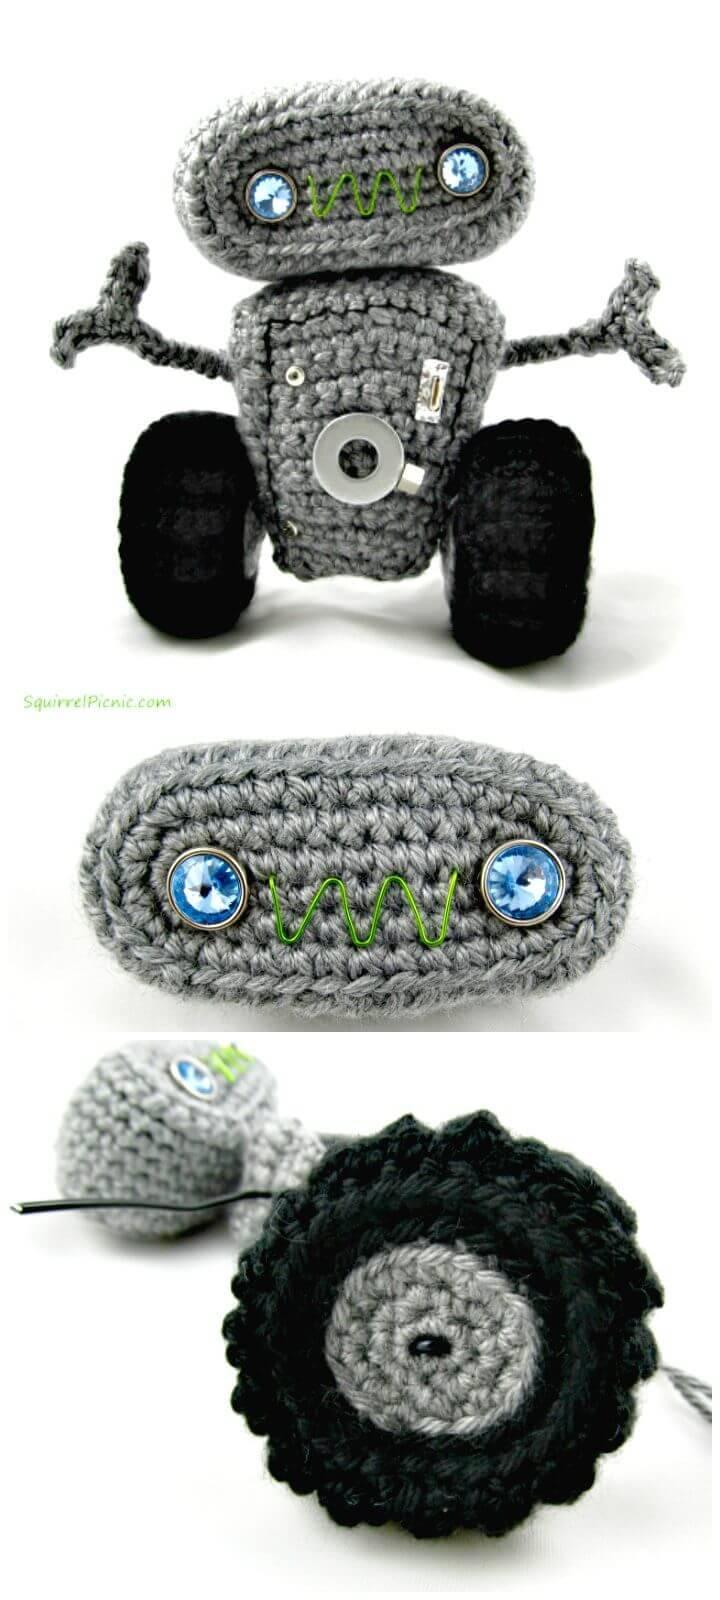 Crochet Cuddly Robot - Free Amigurumi Pattern